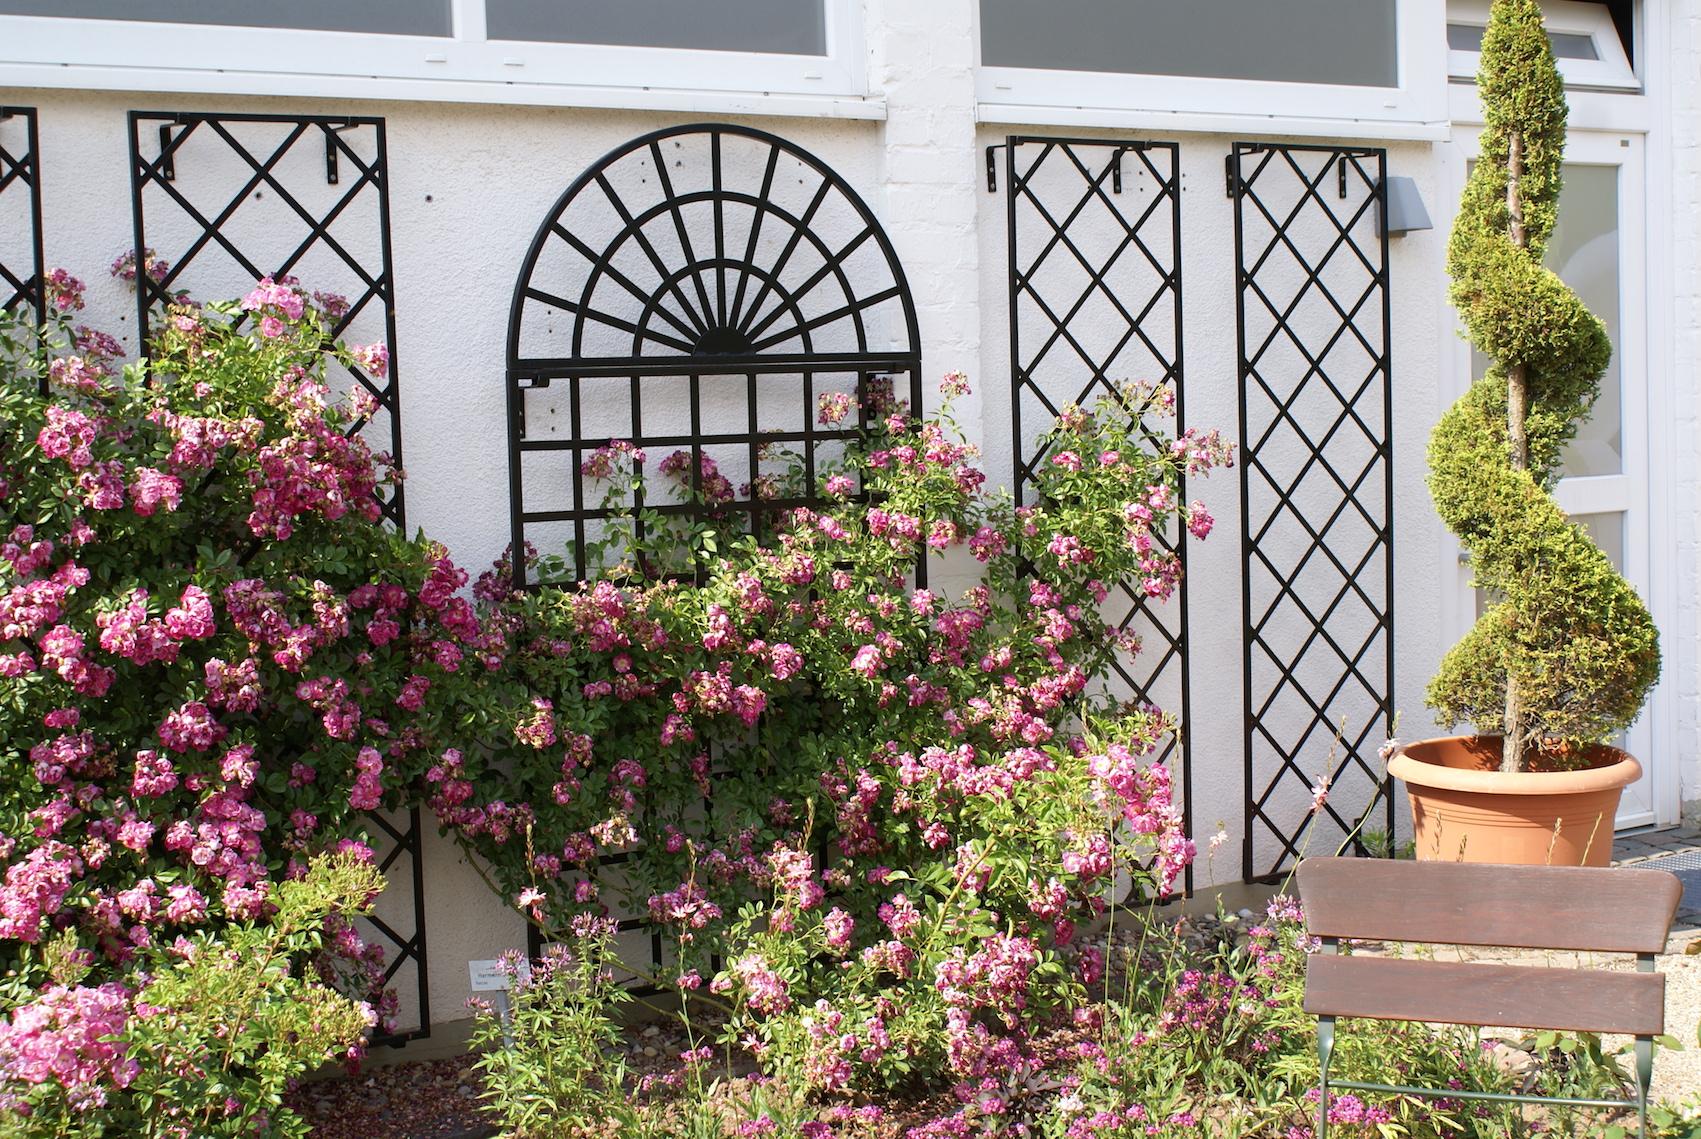 Rosenspalier Schwarz an weißer Wand